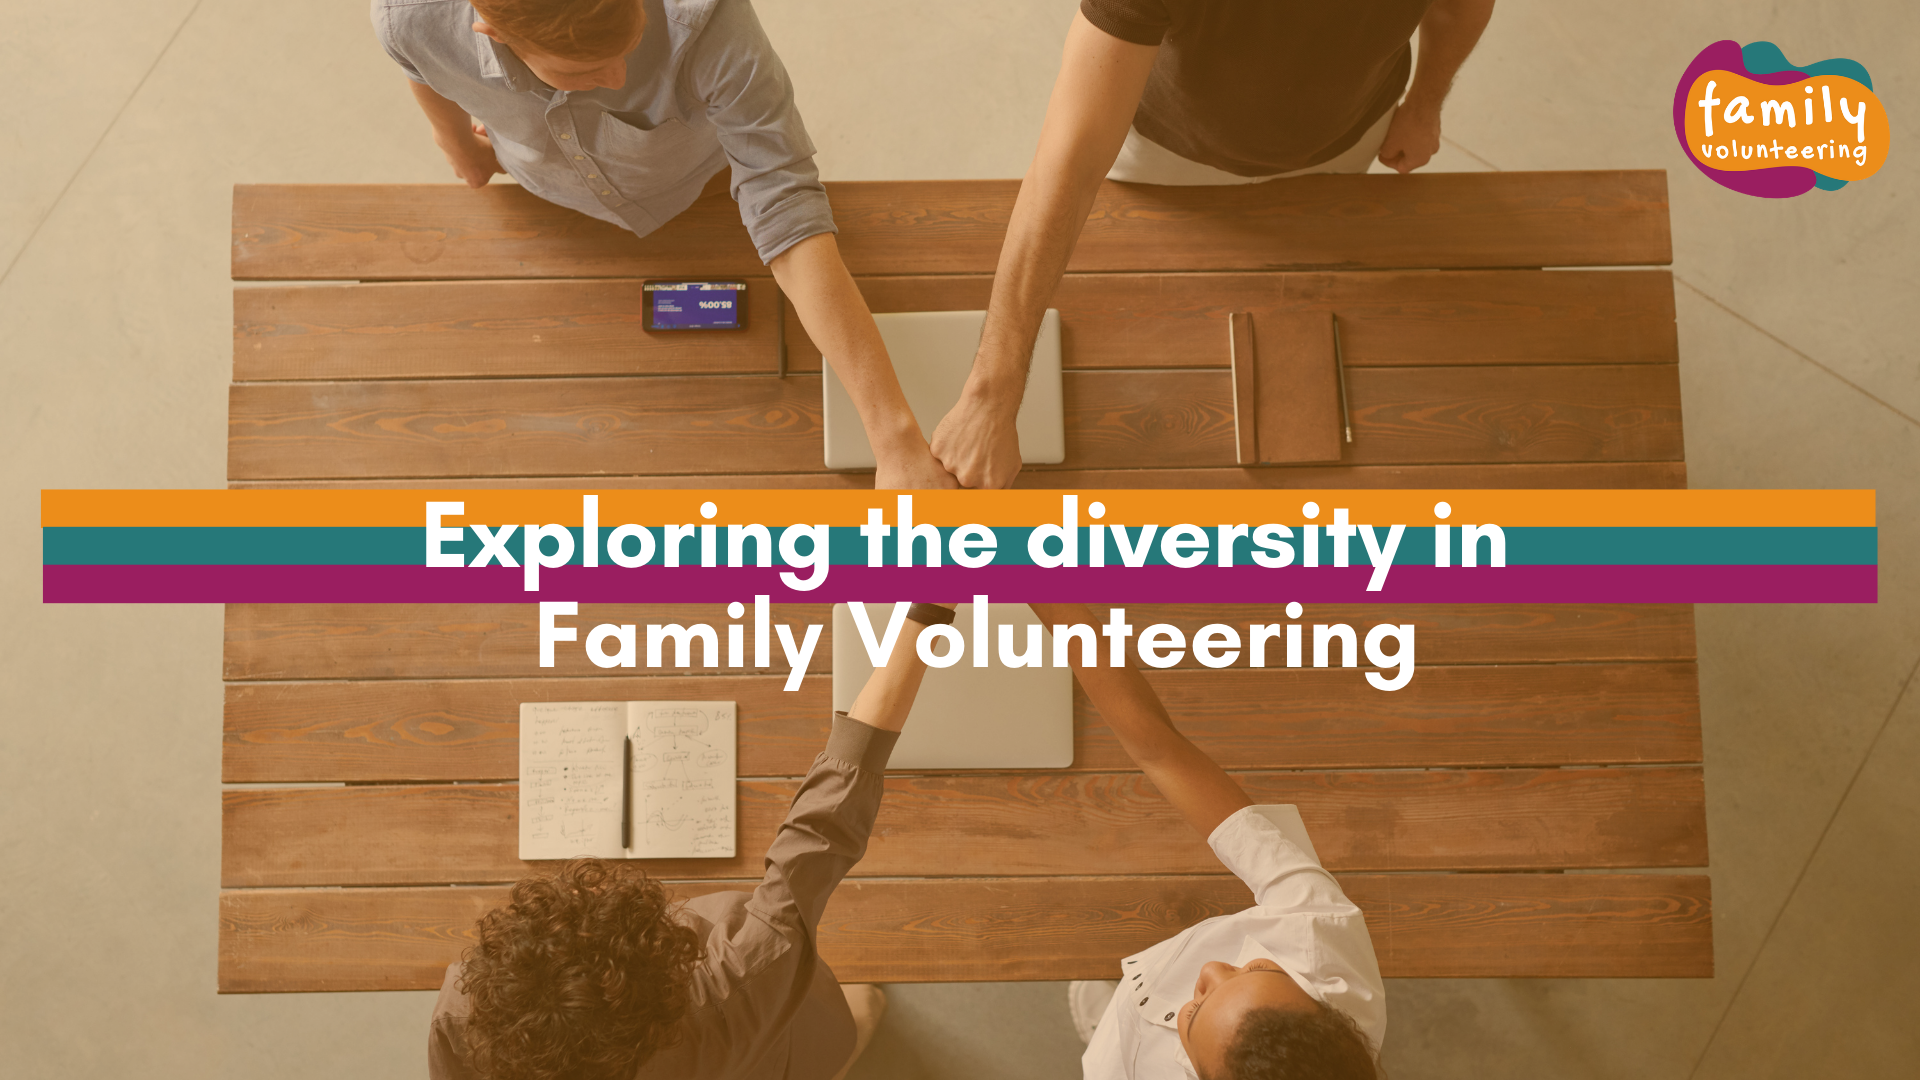 Exploring the diversity in Family Volunteering